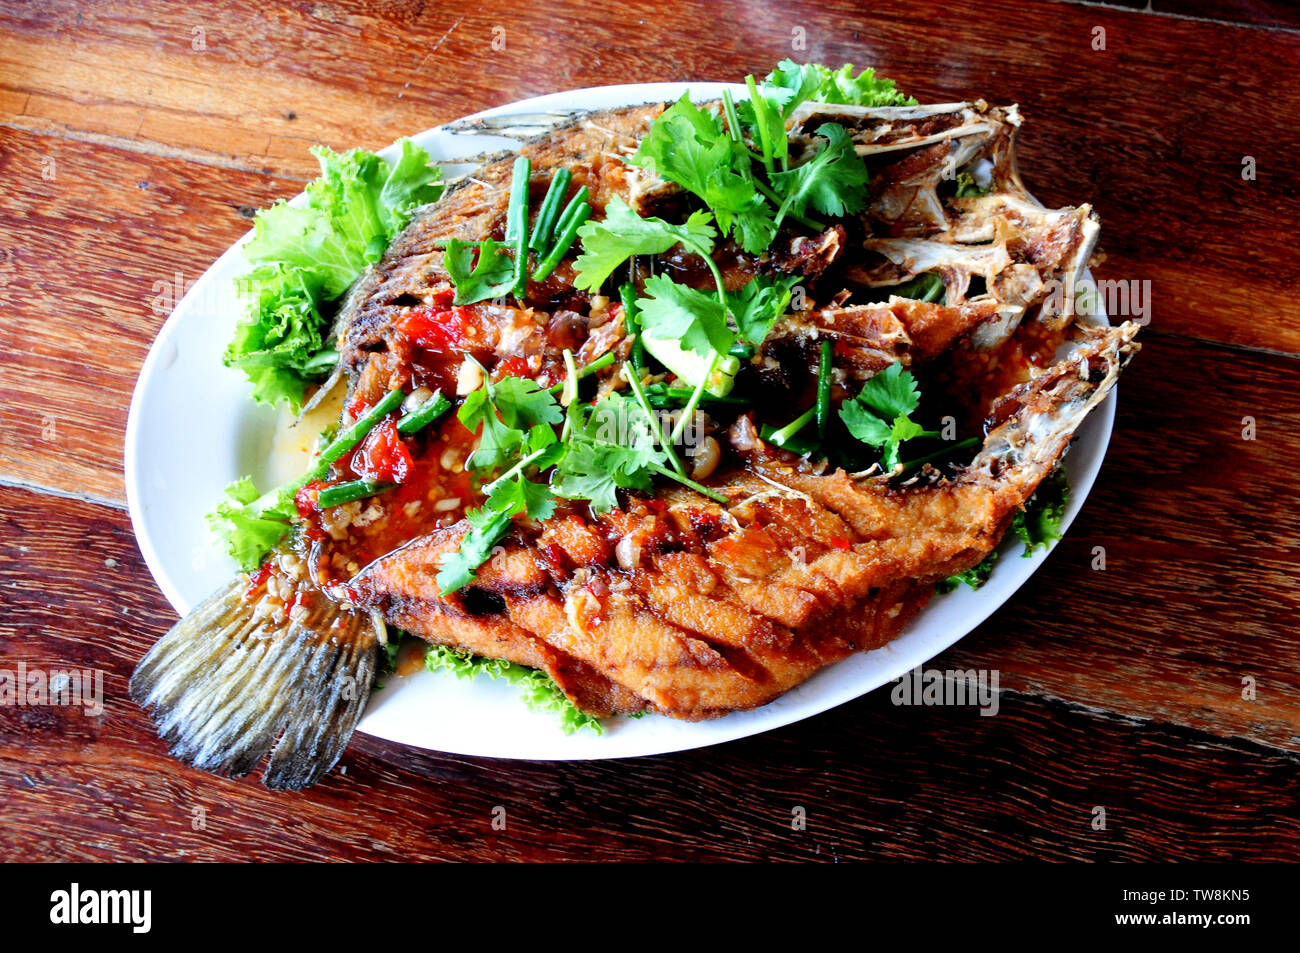 Fried Fish With Sweet Chili Sauce Recipe Pla Rad Prik Stock Photo Alamy